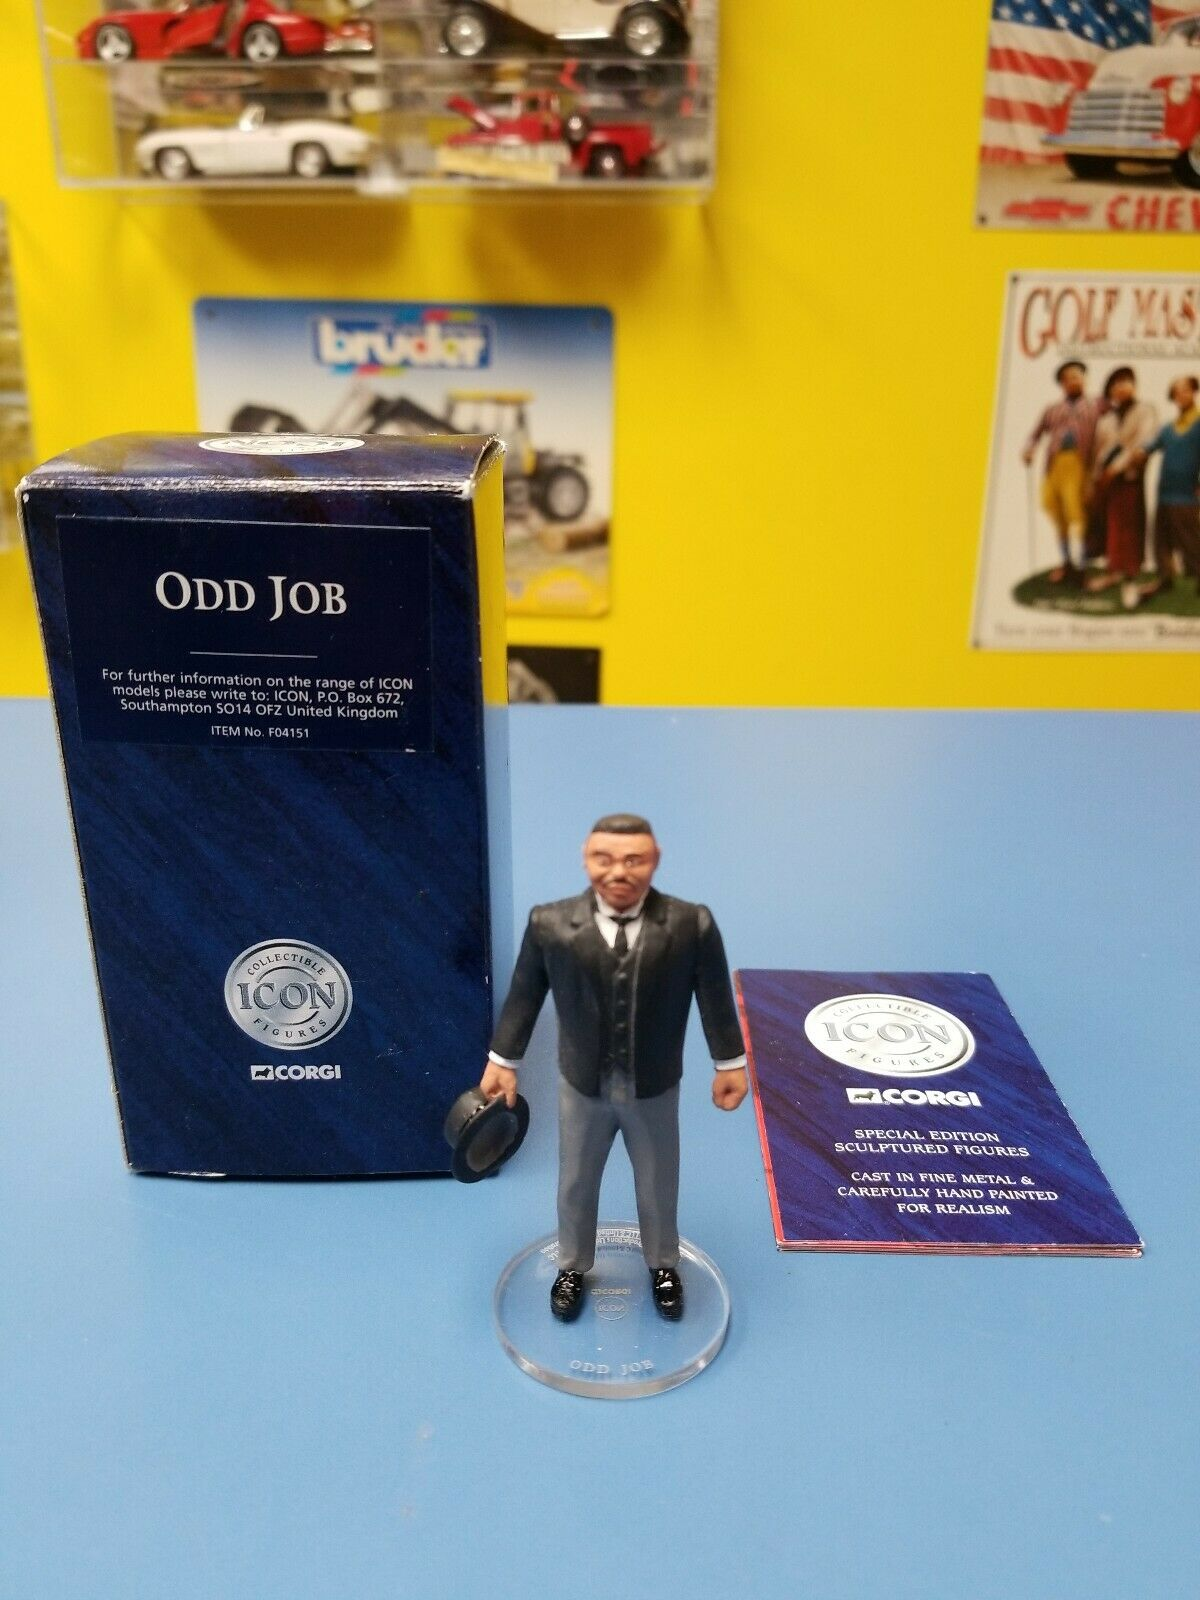 CORGI JAMES BOND 007  ODD JOB   FIGURE FIGURE FIGURE  ICON COLLECTION  NEW a7b6ee